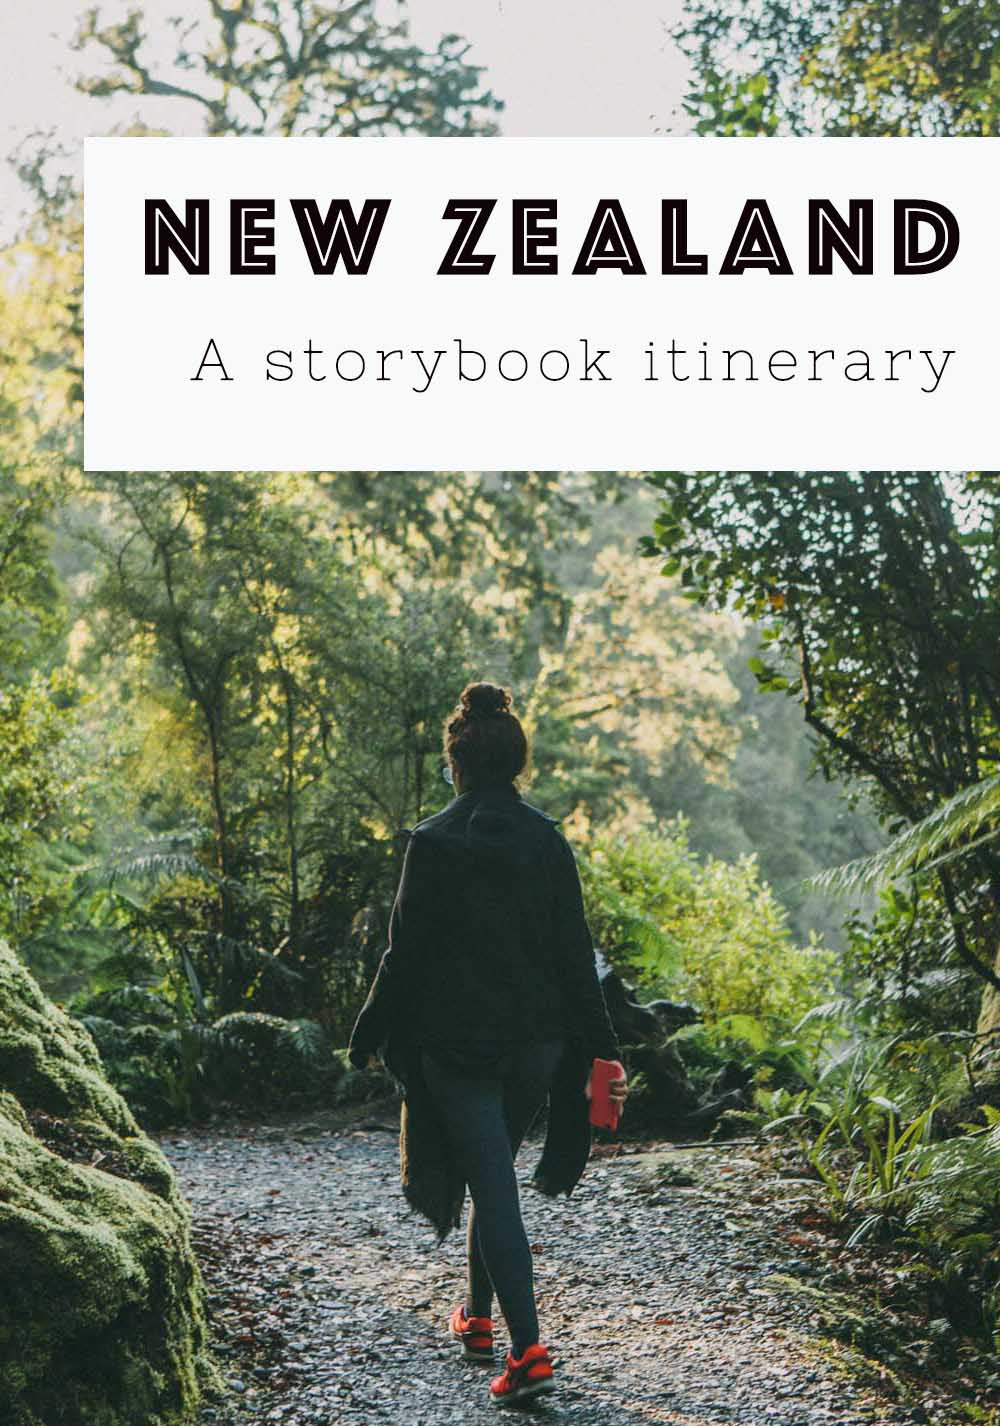 New Zealand storybook itinerary